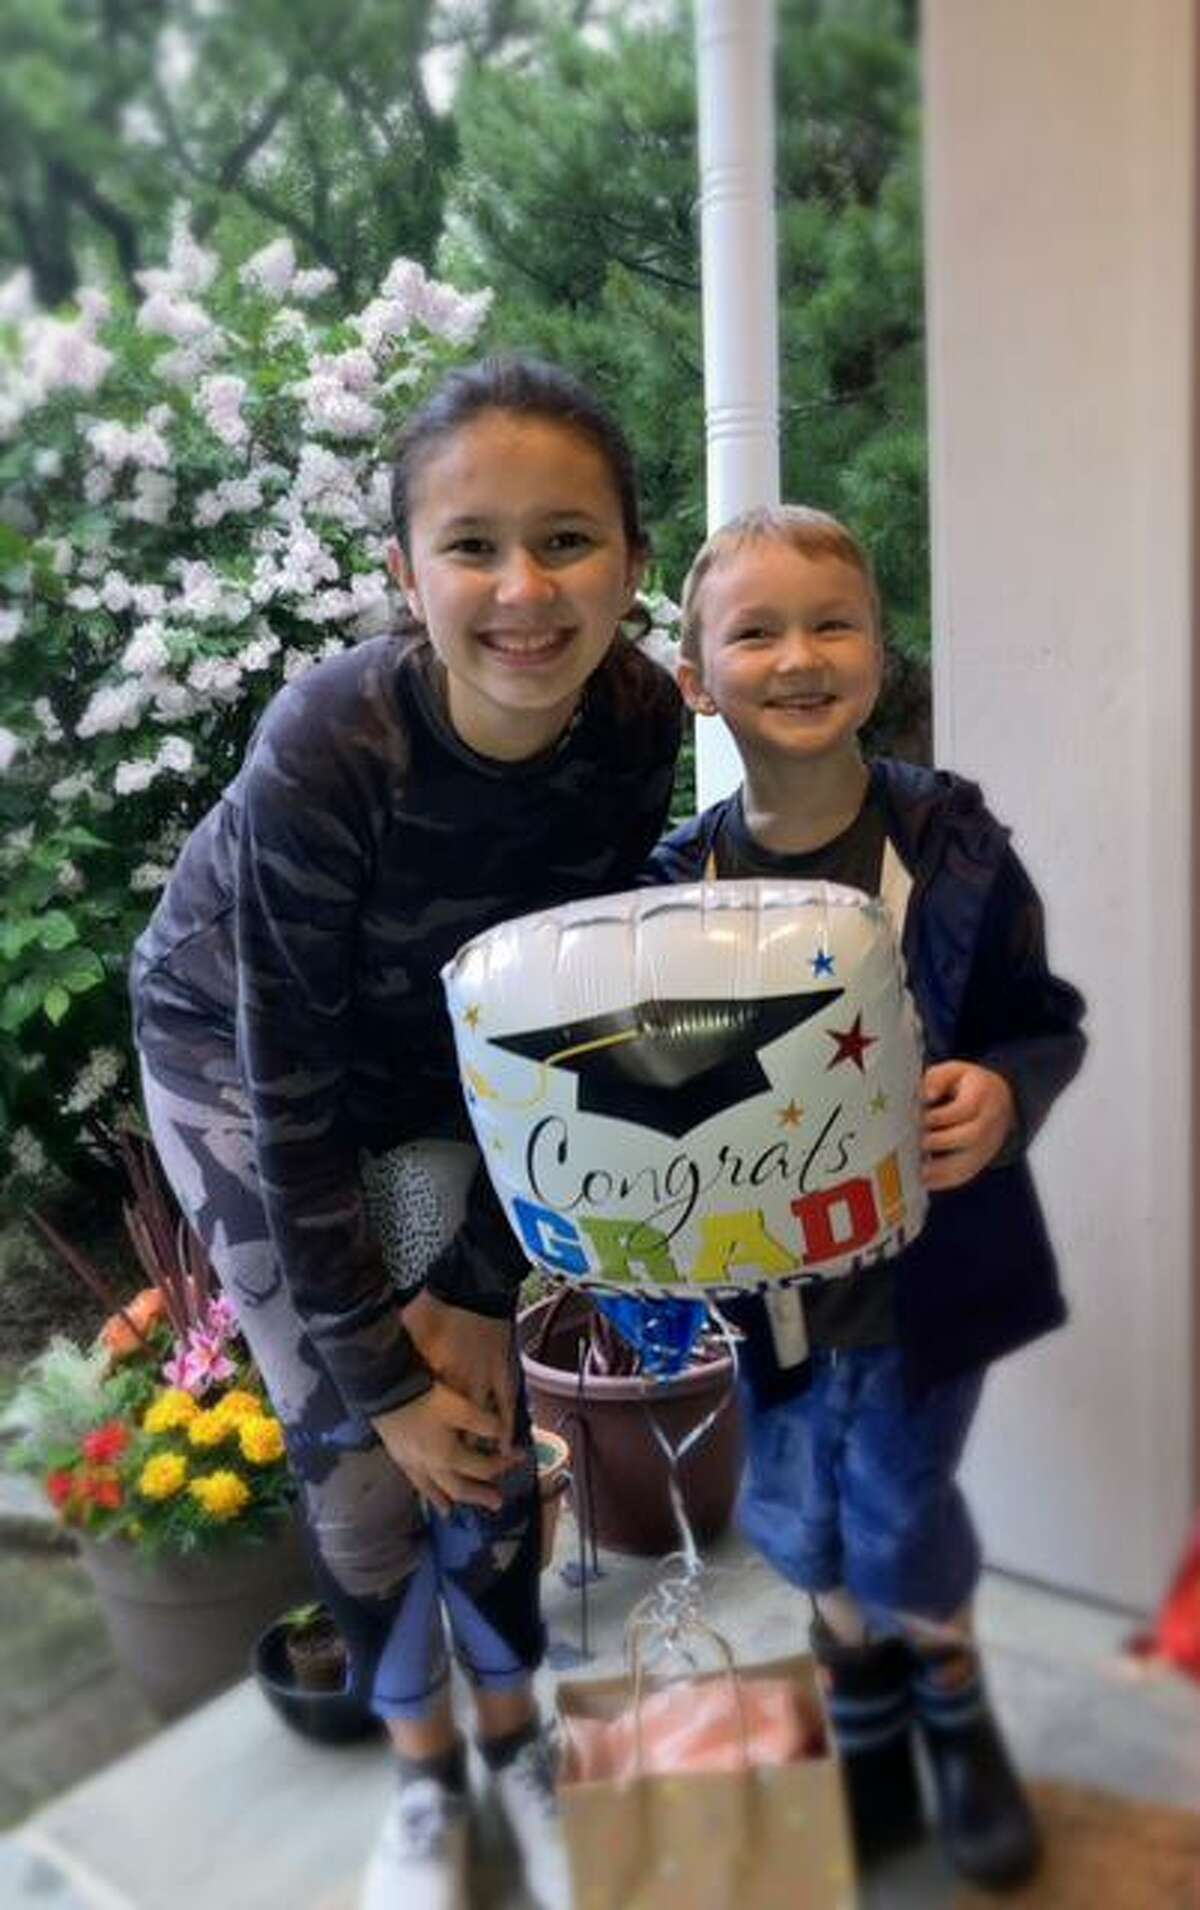 The Biolsi family gave special gifts for Darien High senior Charlotte deWeaver.